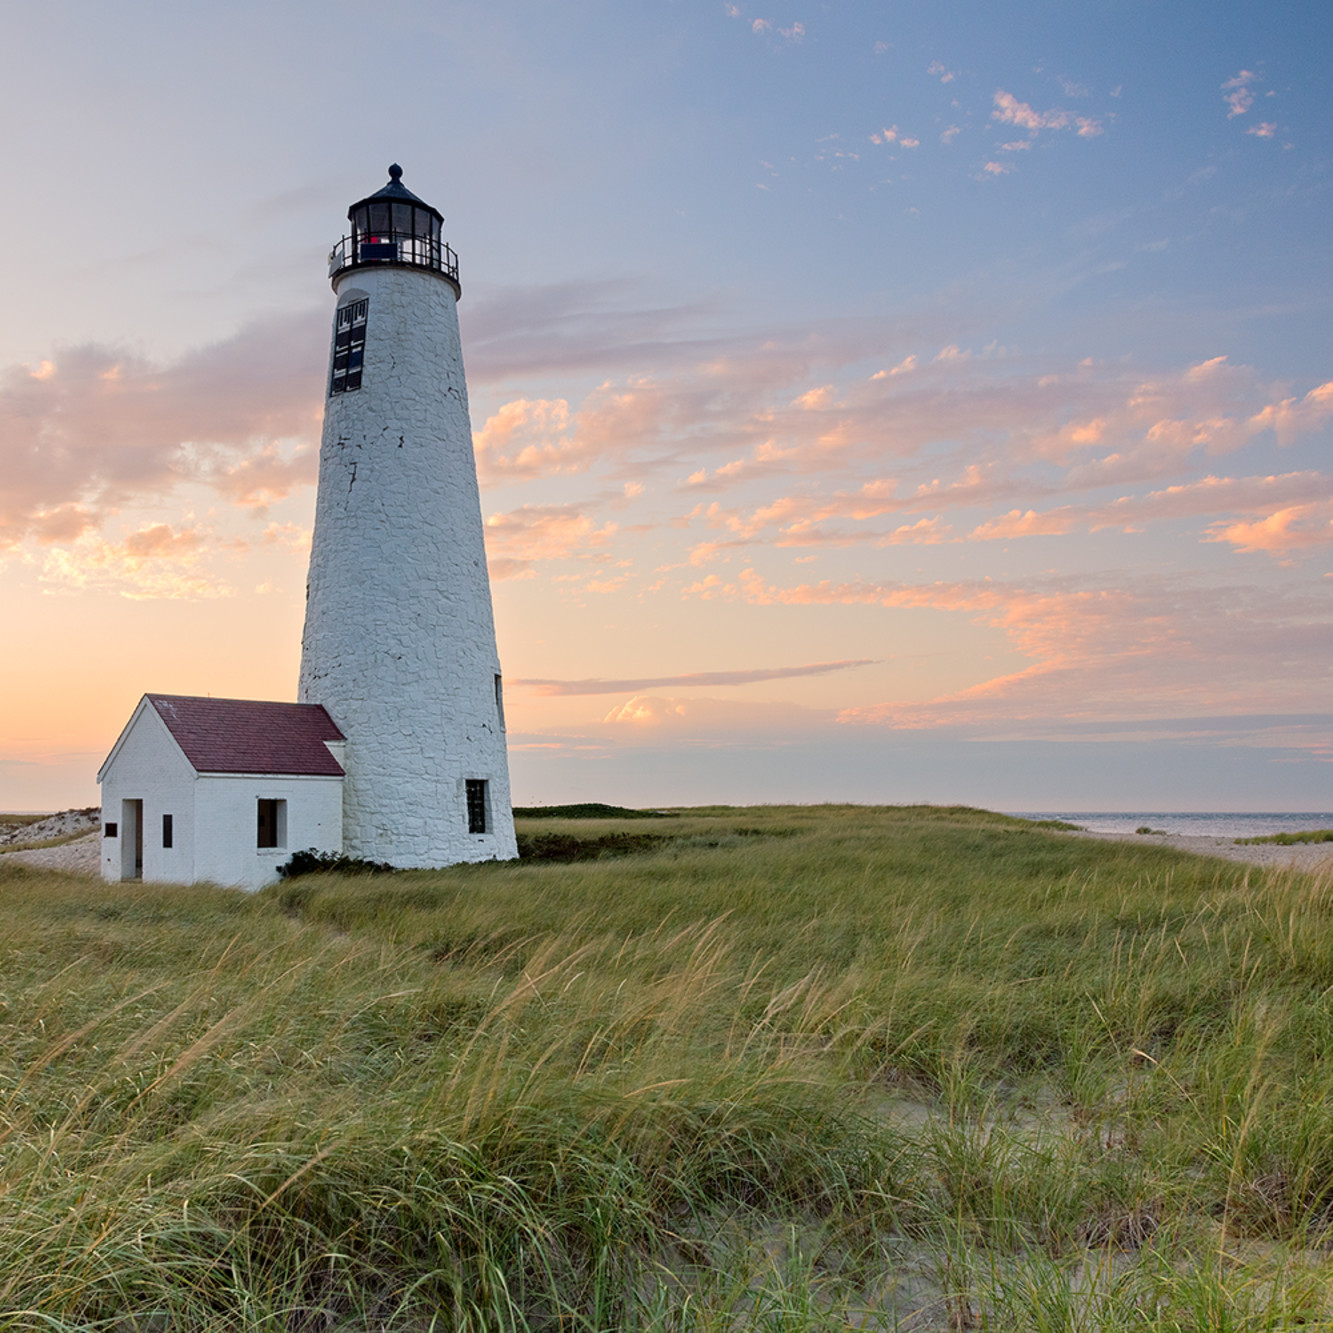 Great point lighthouse nantucket sunset web e5wprm